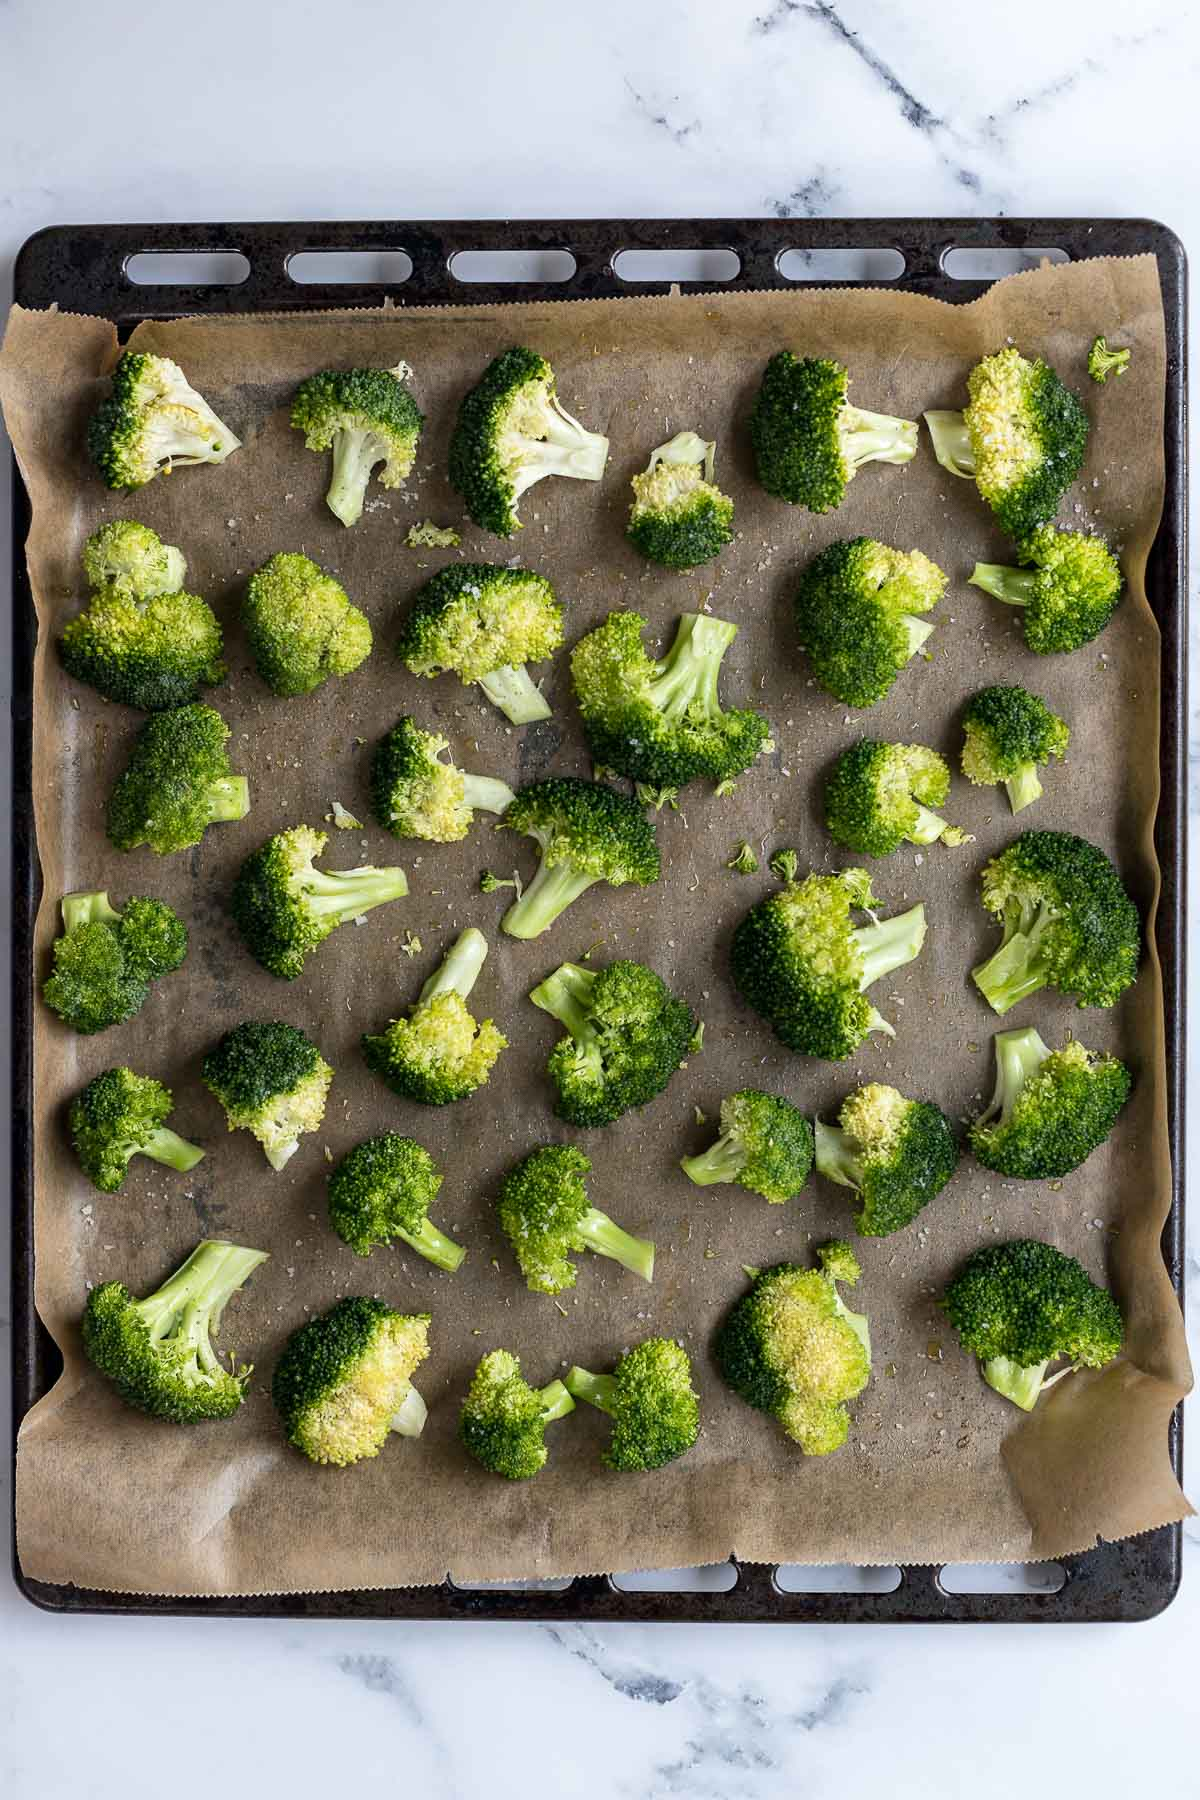 Brokkoli Röschen auf Backblech